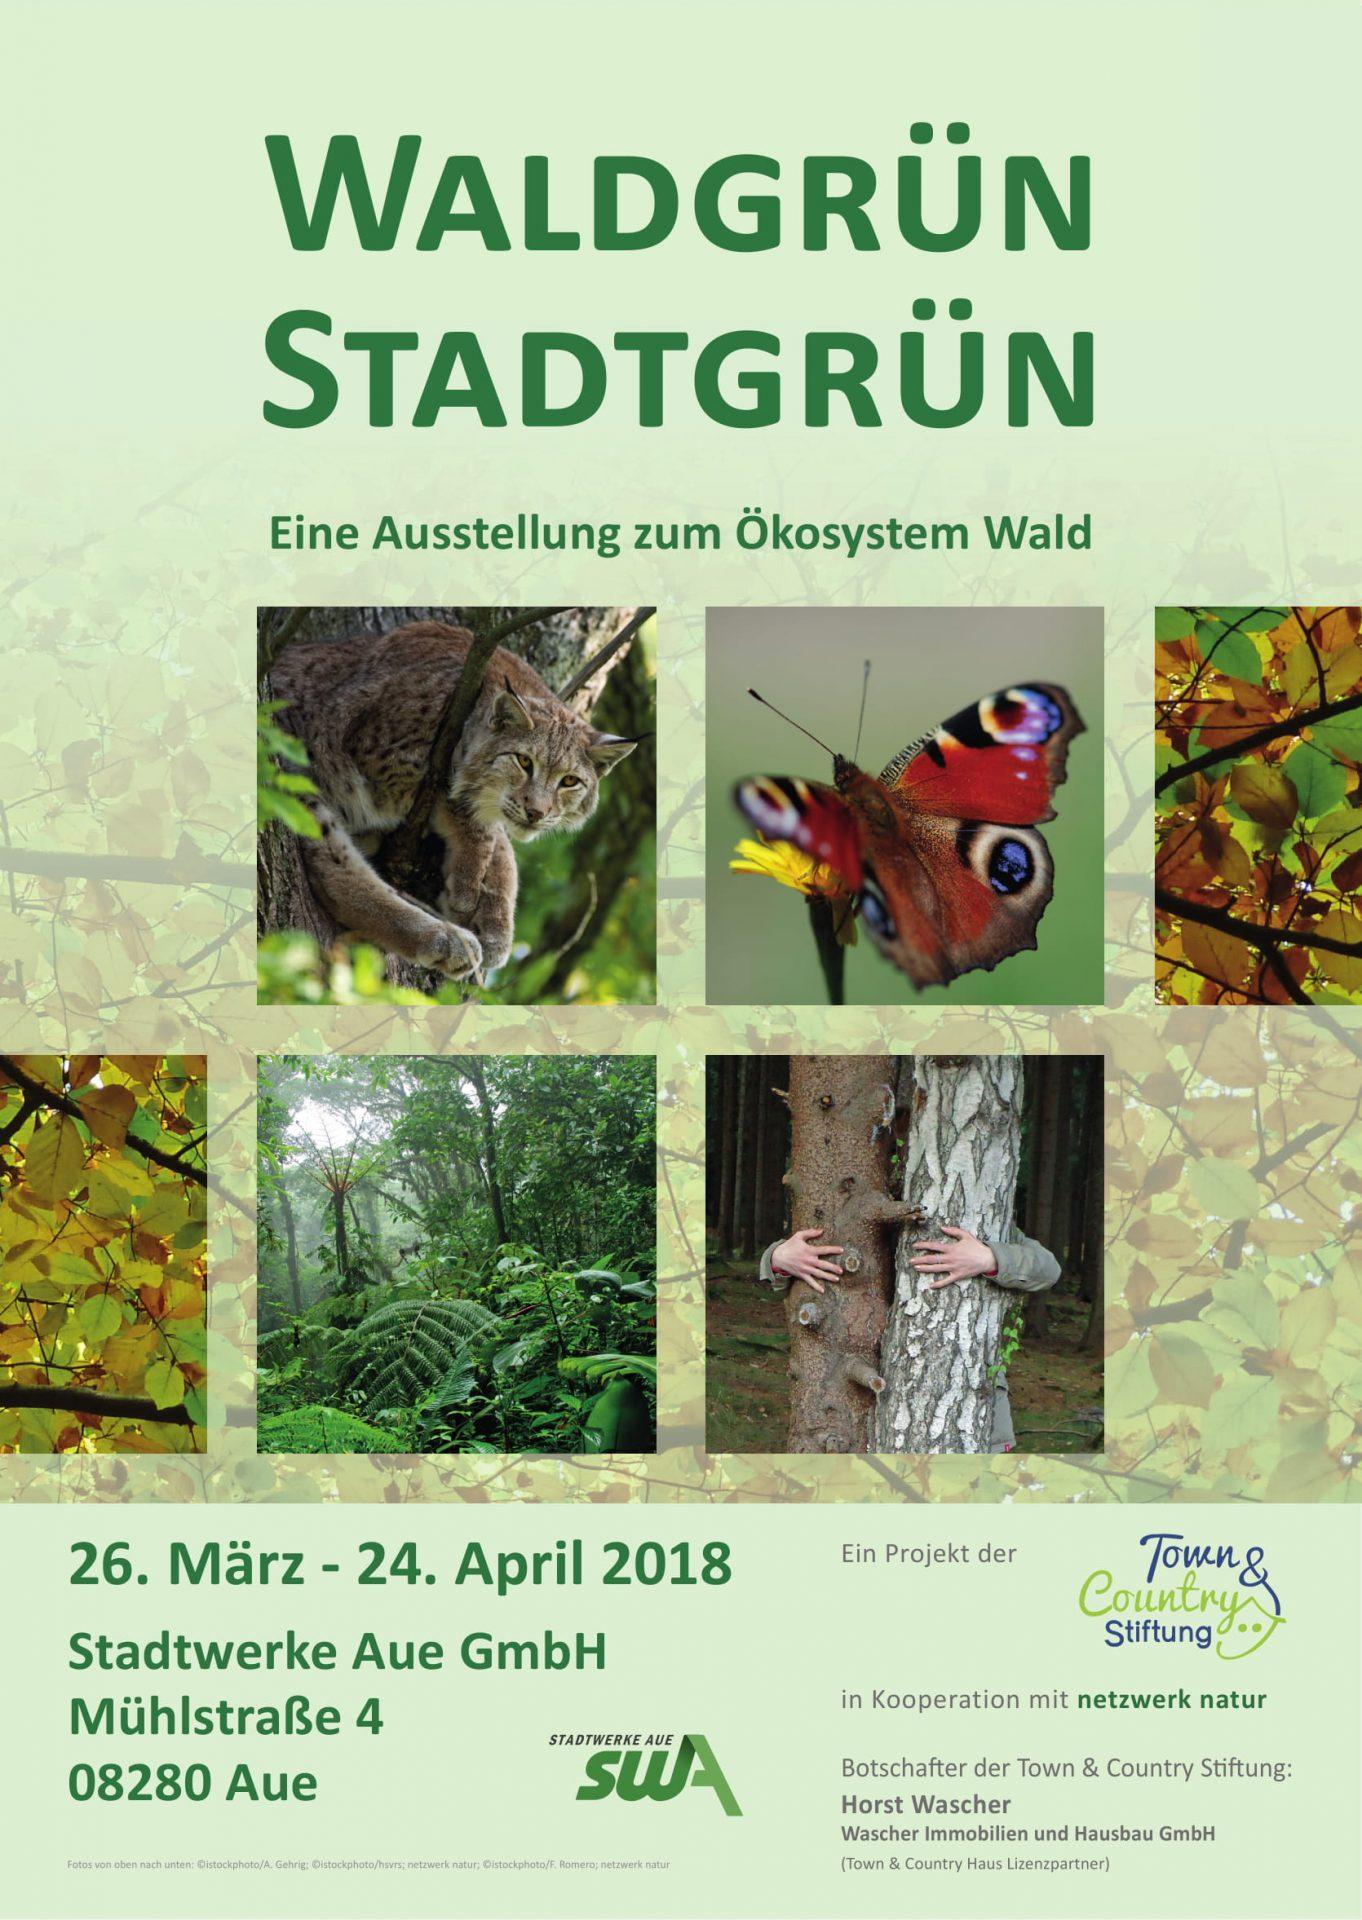 netzwerk natur, WALDGRÜN - STADTGRÜN in Aue, Plakat zur Ausstellung